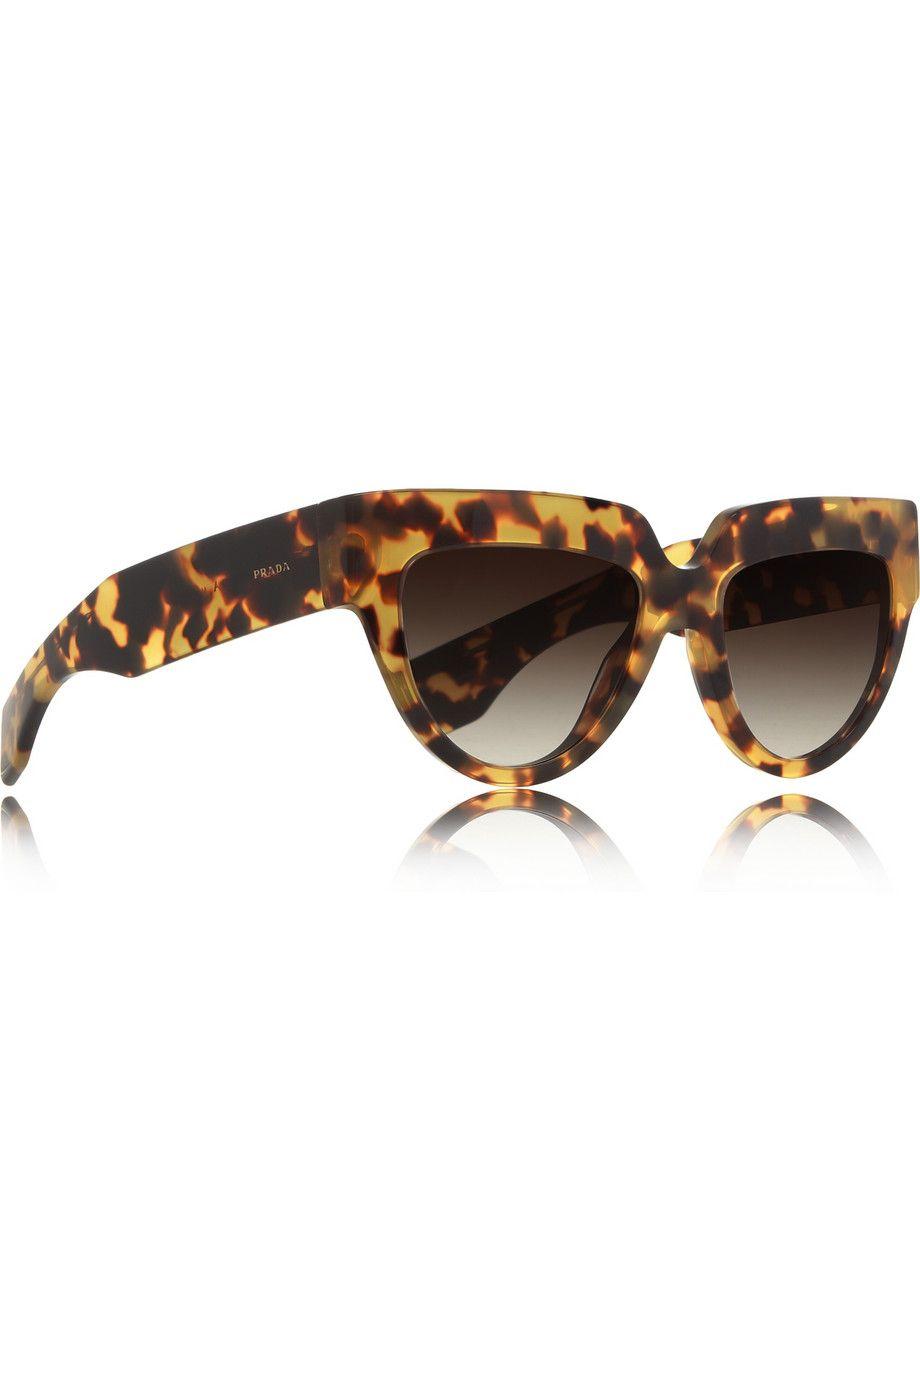 5e9930b4d Prada | Cat eye tortoiseshell acetate sunglasses | NET-A-PORTER.COM ...